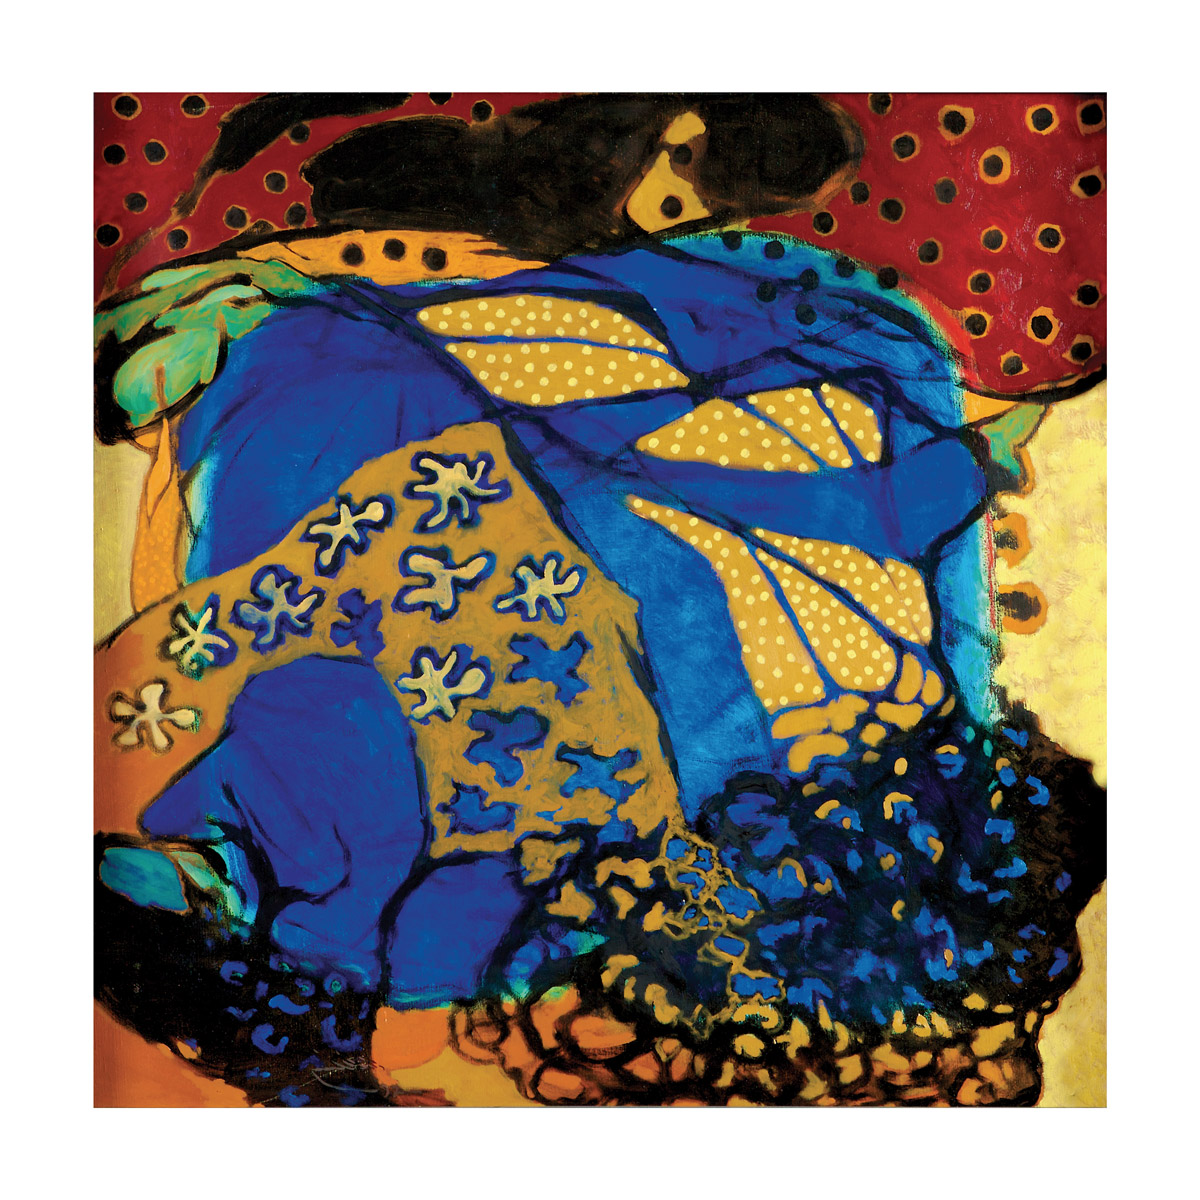 rashid al khalifa artwork abstract